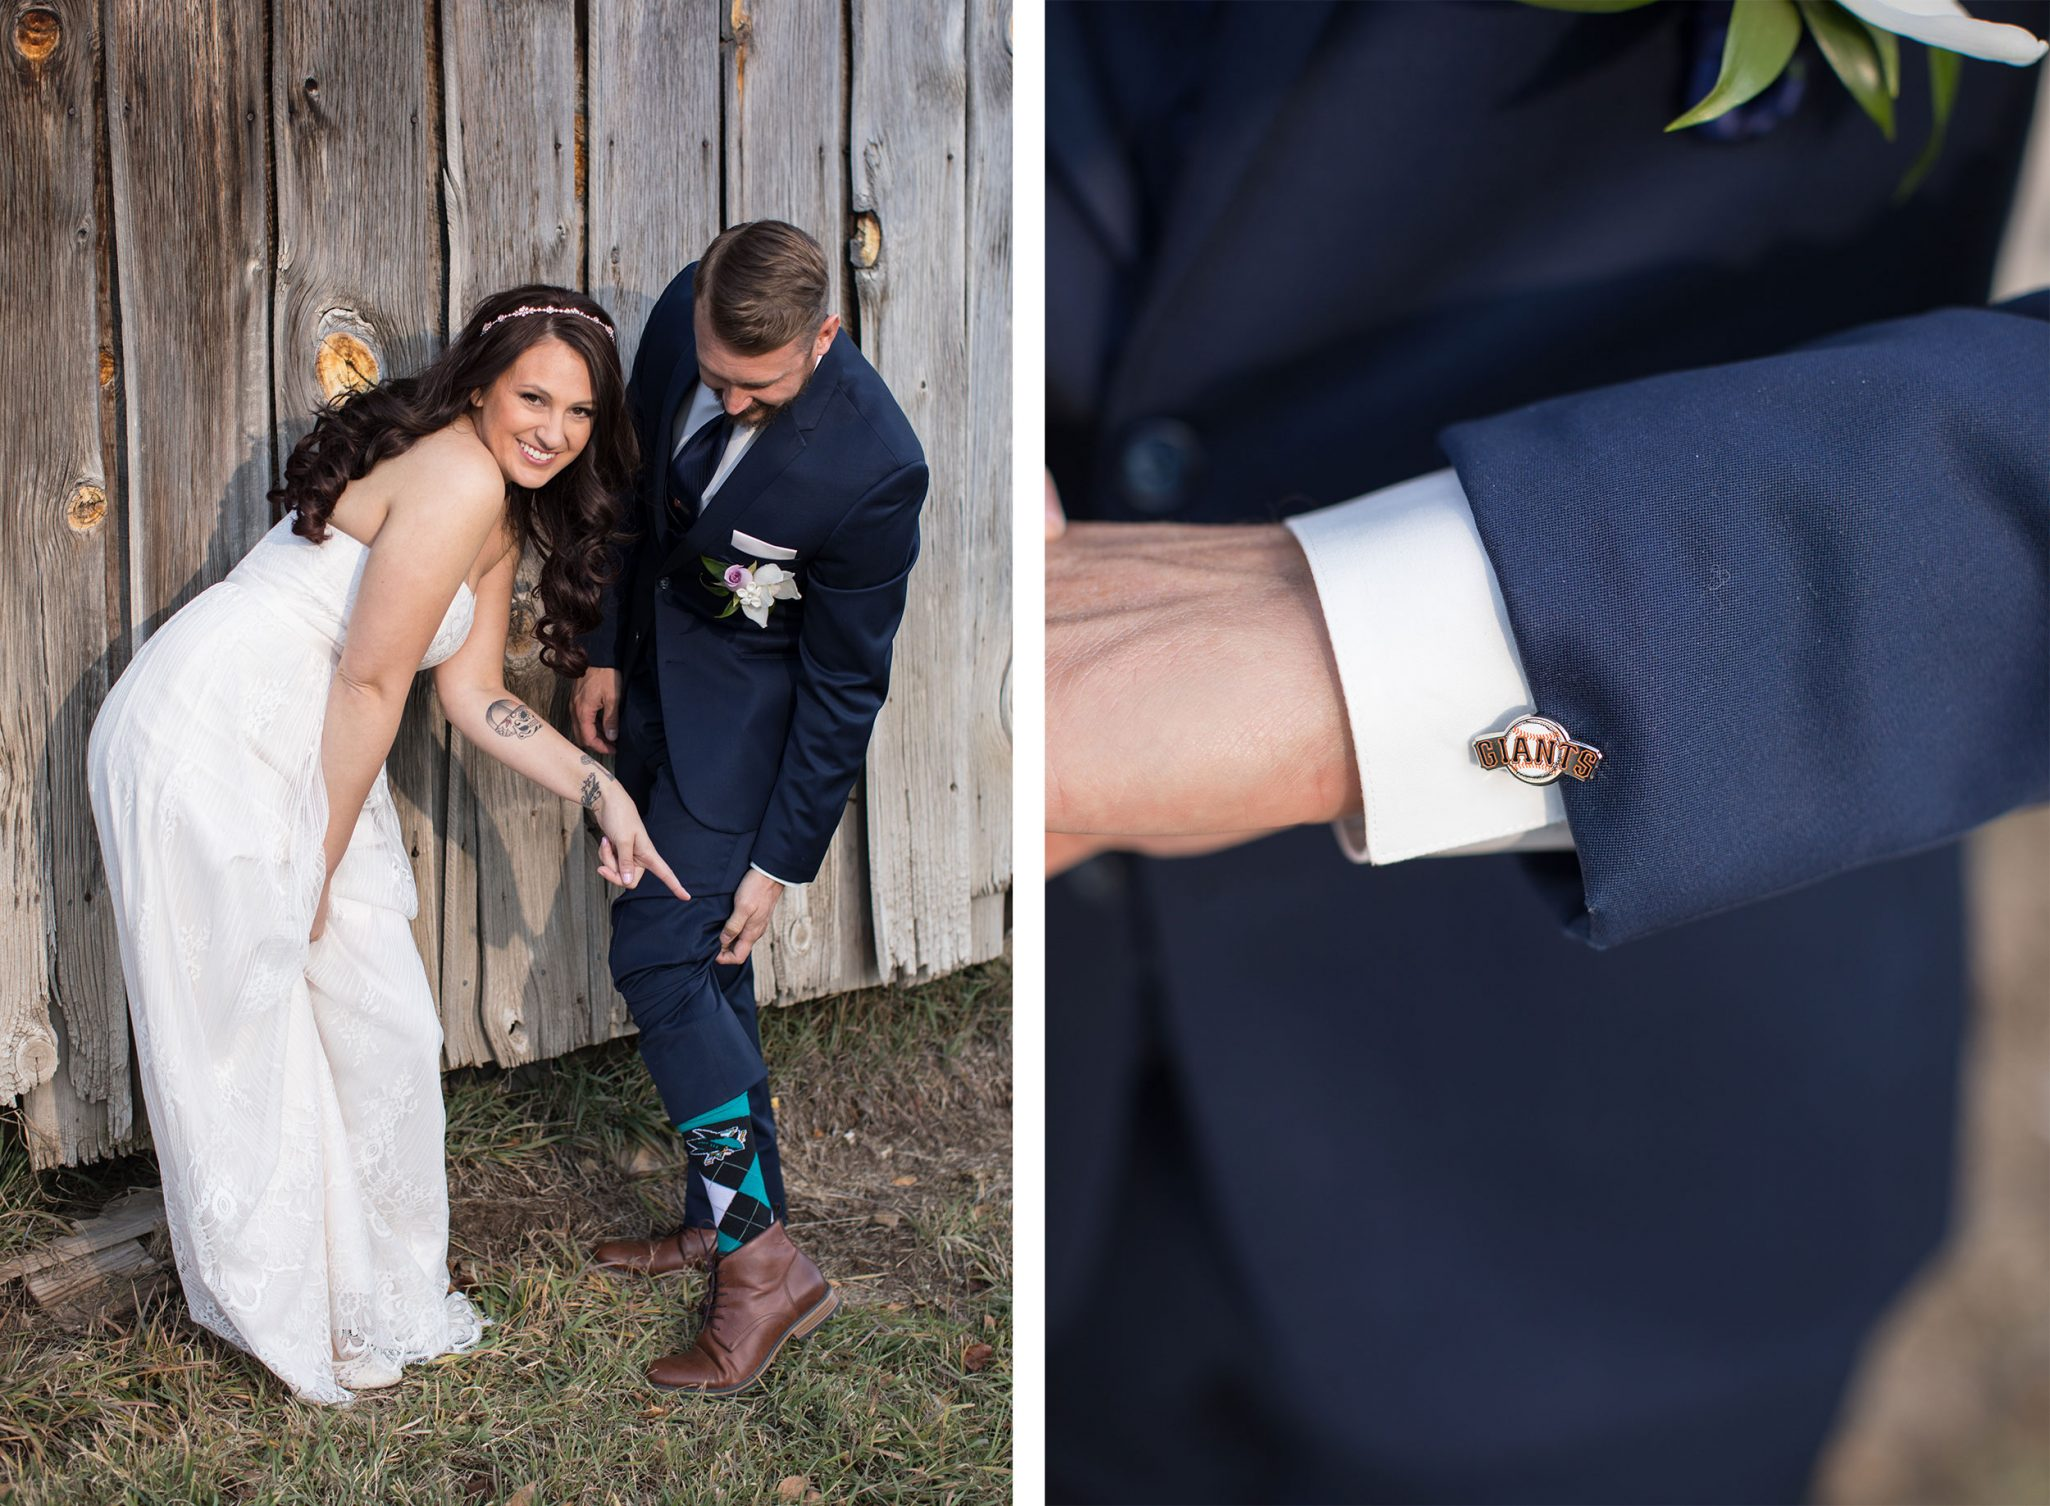 Groom's wedding socks & cuff links